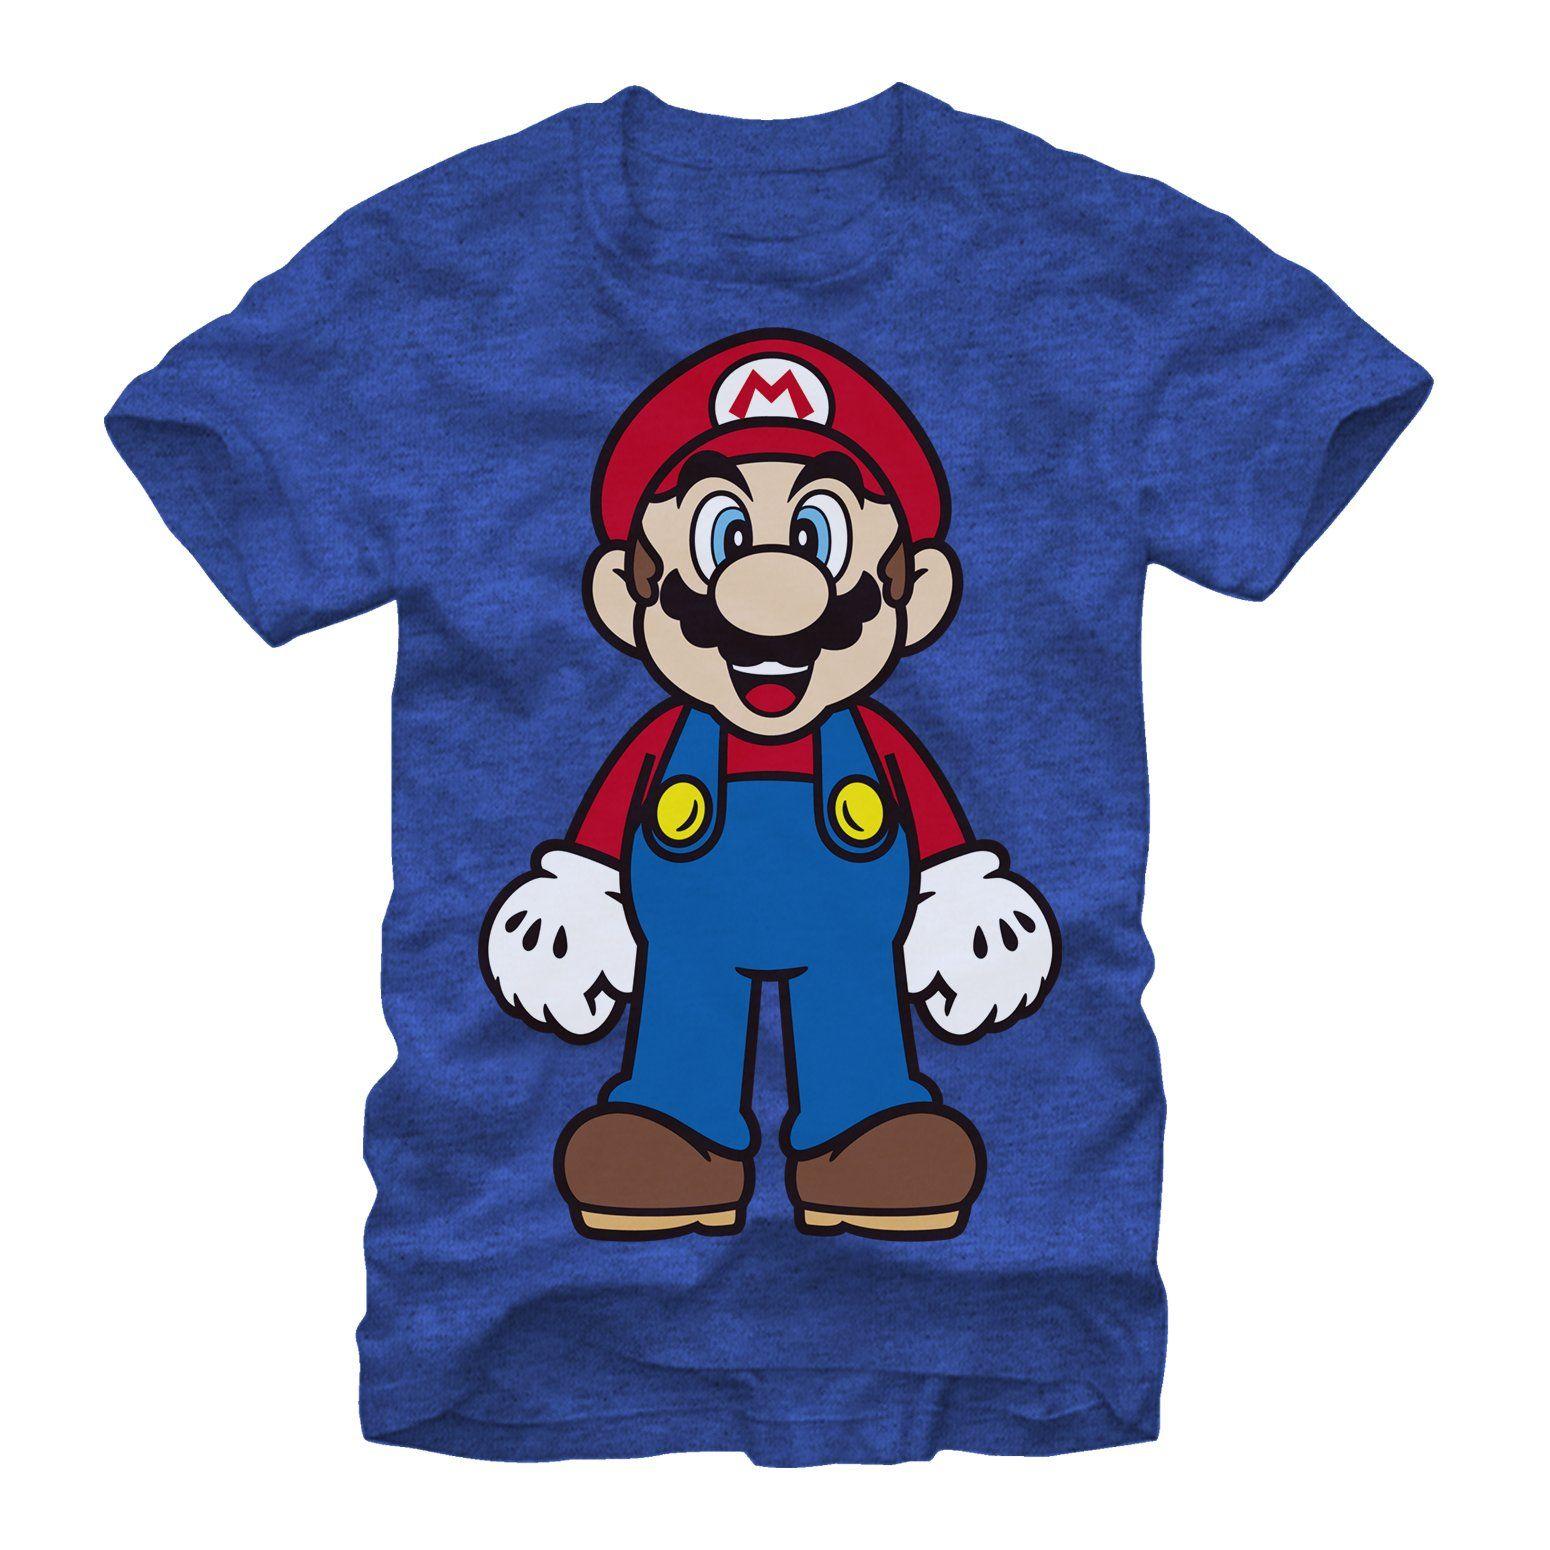 Nintendo Men S Tall Mario T Shirt Royal Heather In 2021 Graphic Tees Royal Blue T Shirt Fifth Sun [ 1550 x 1550 Pixel ]